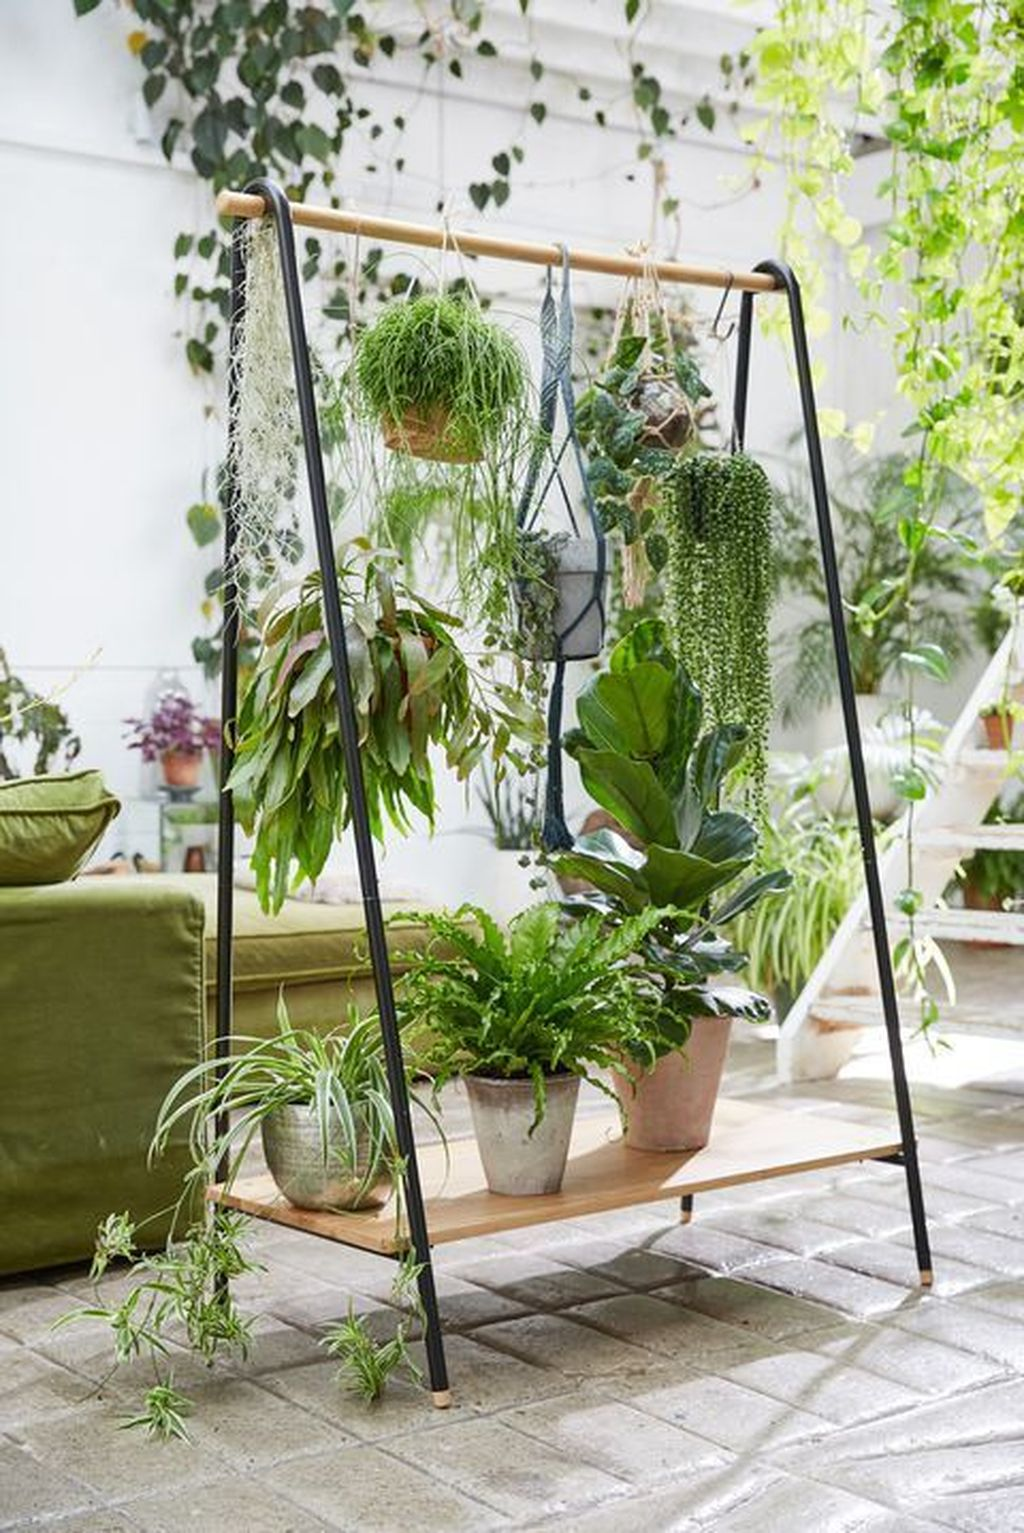 The Best Indoor Garden Ideas To Beautify Your Home 08